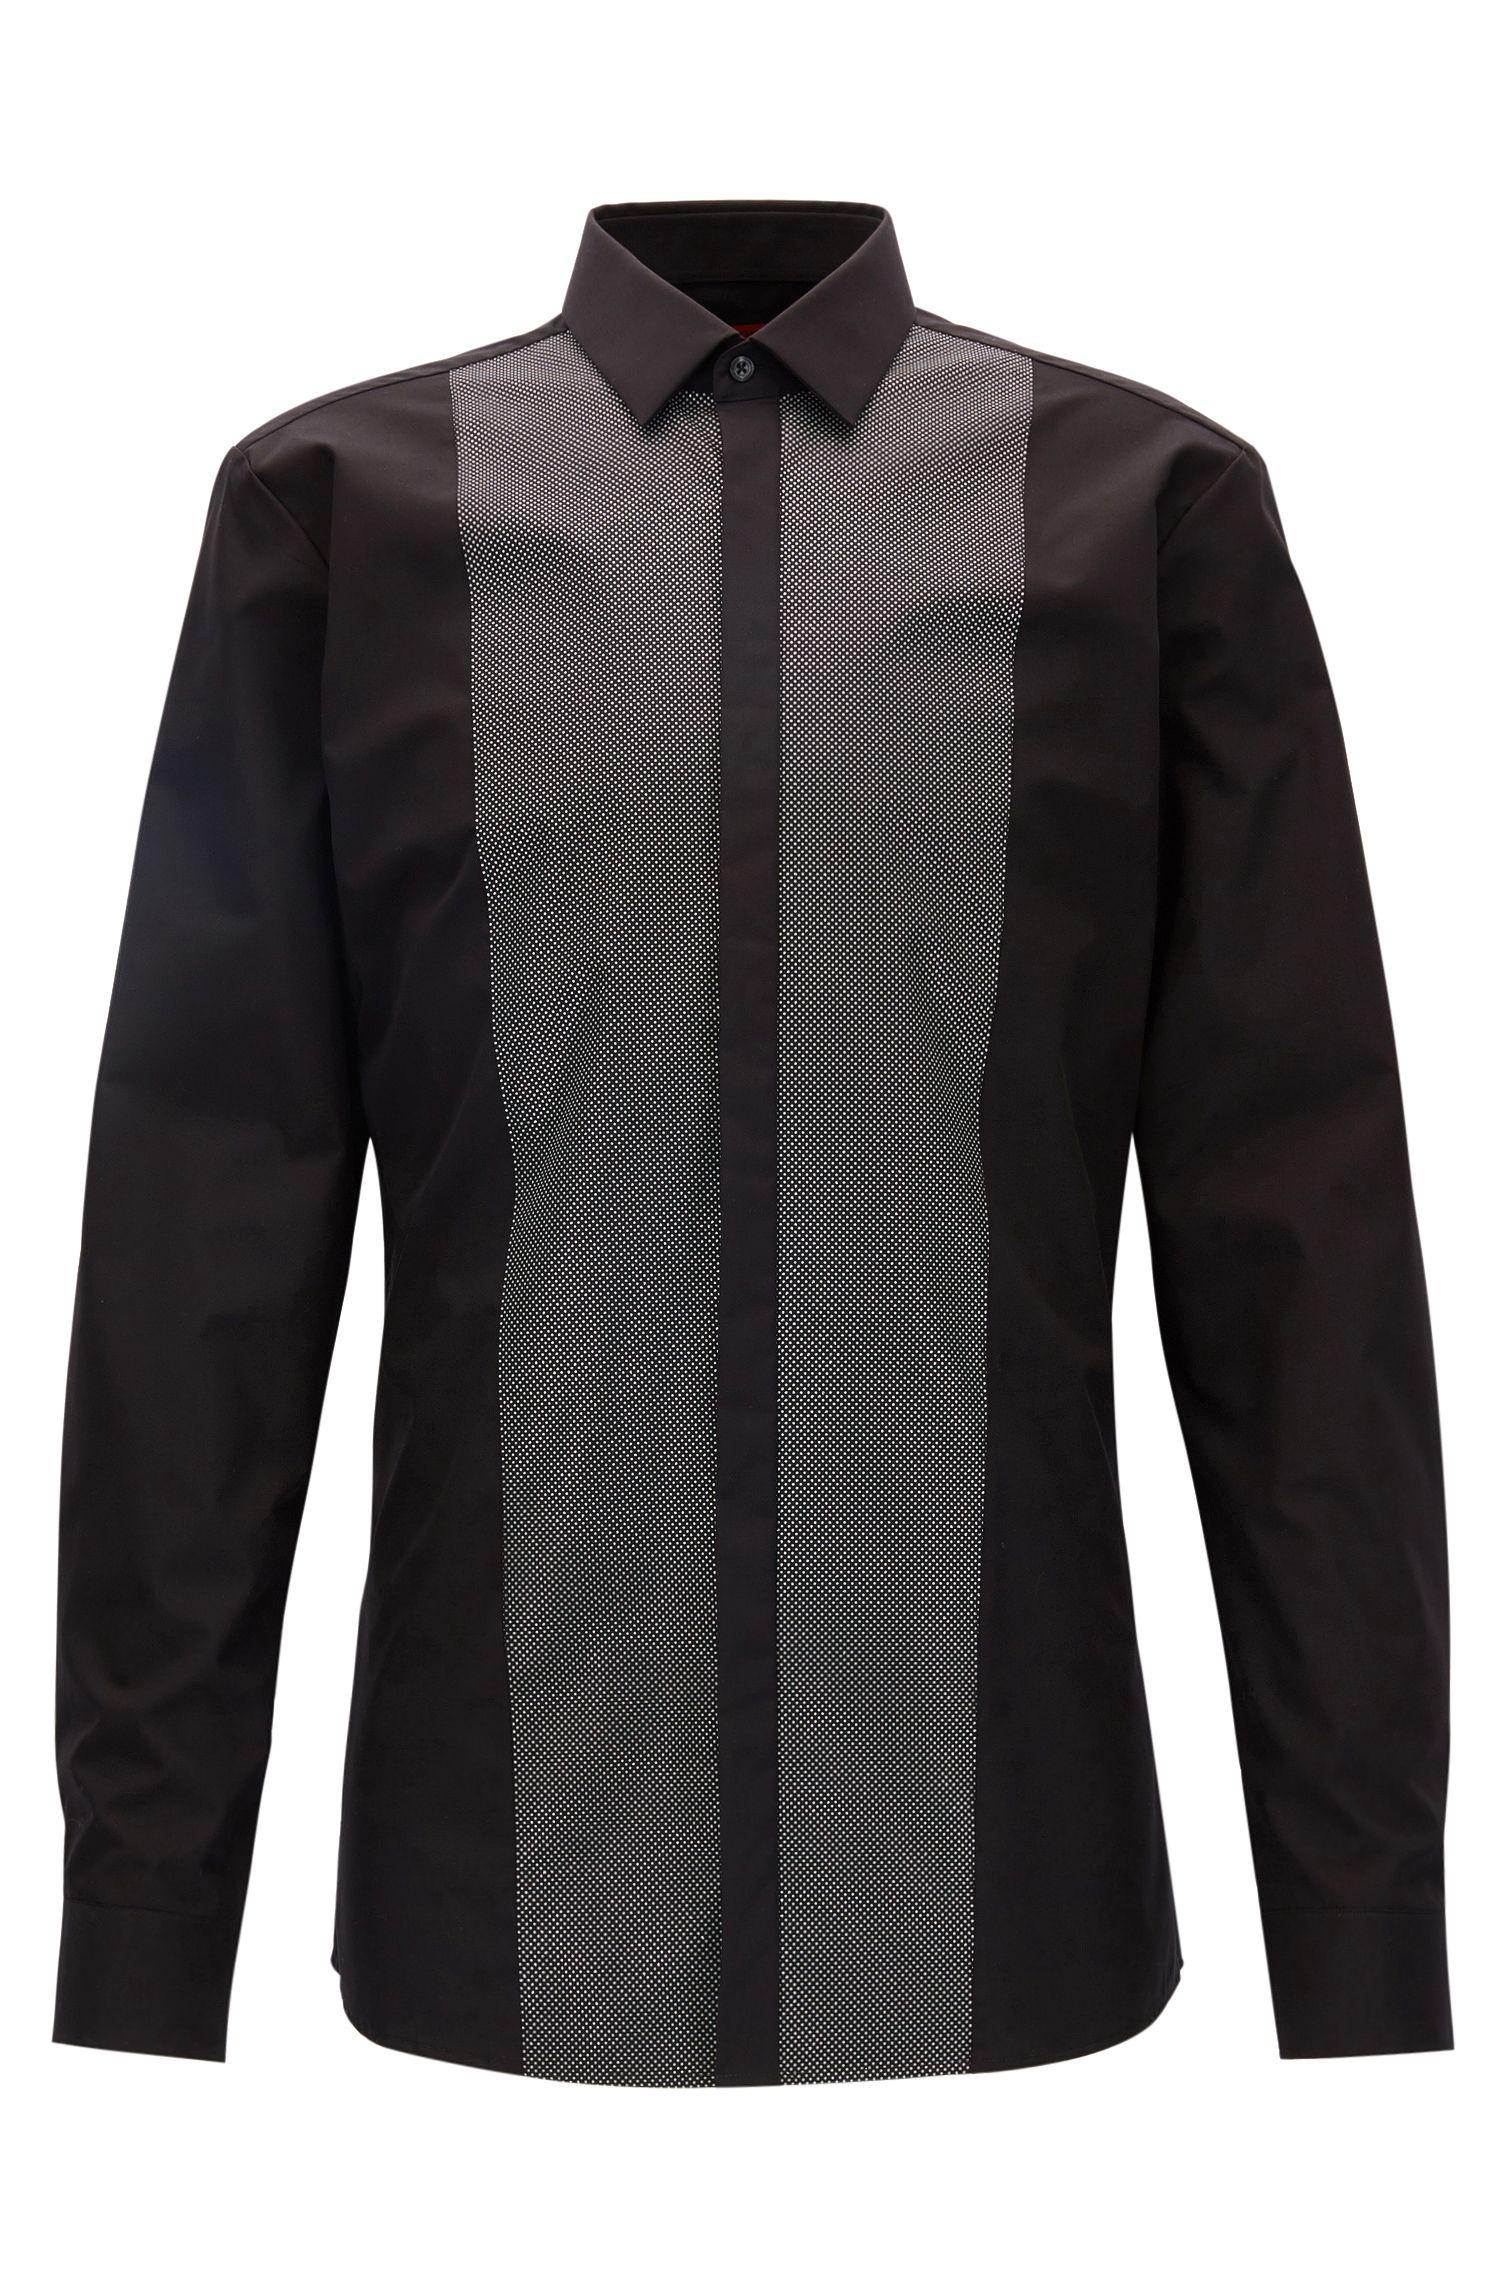 Metallic Print Easy Iron Dress Shirt, Extra-Slim Fit | Easto